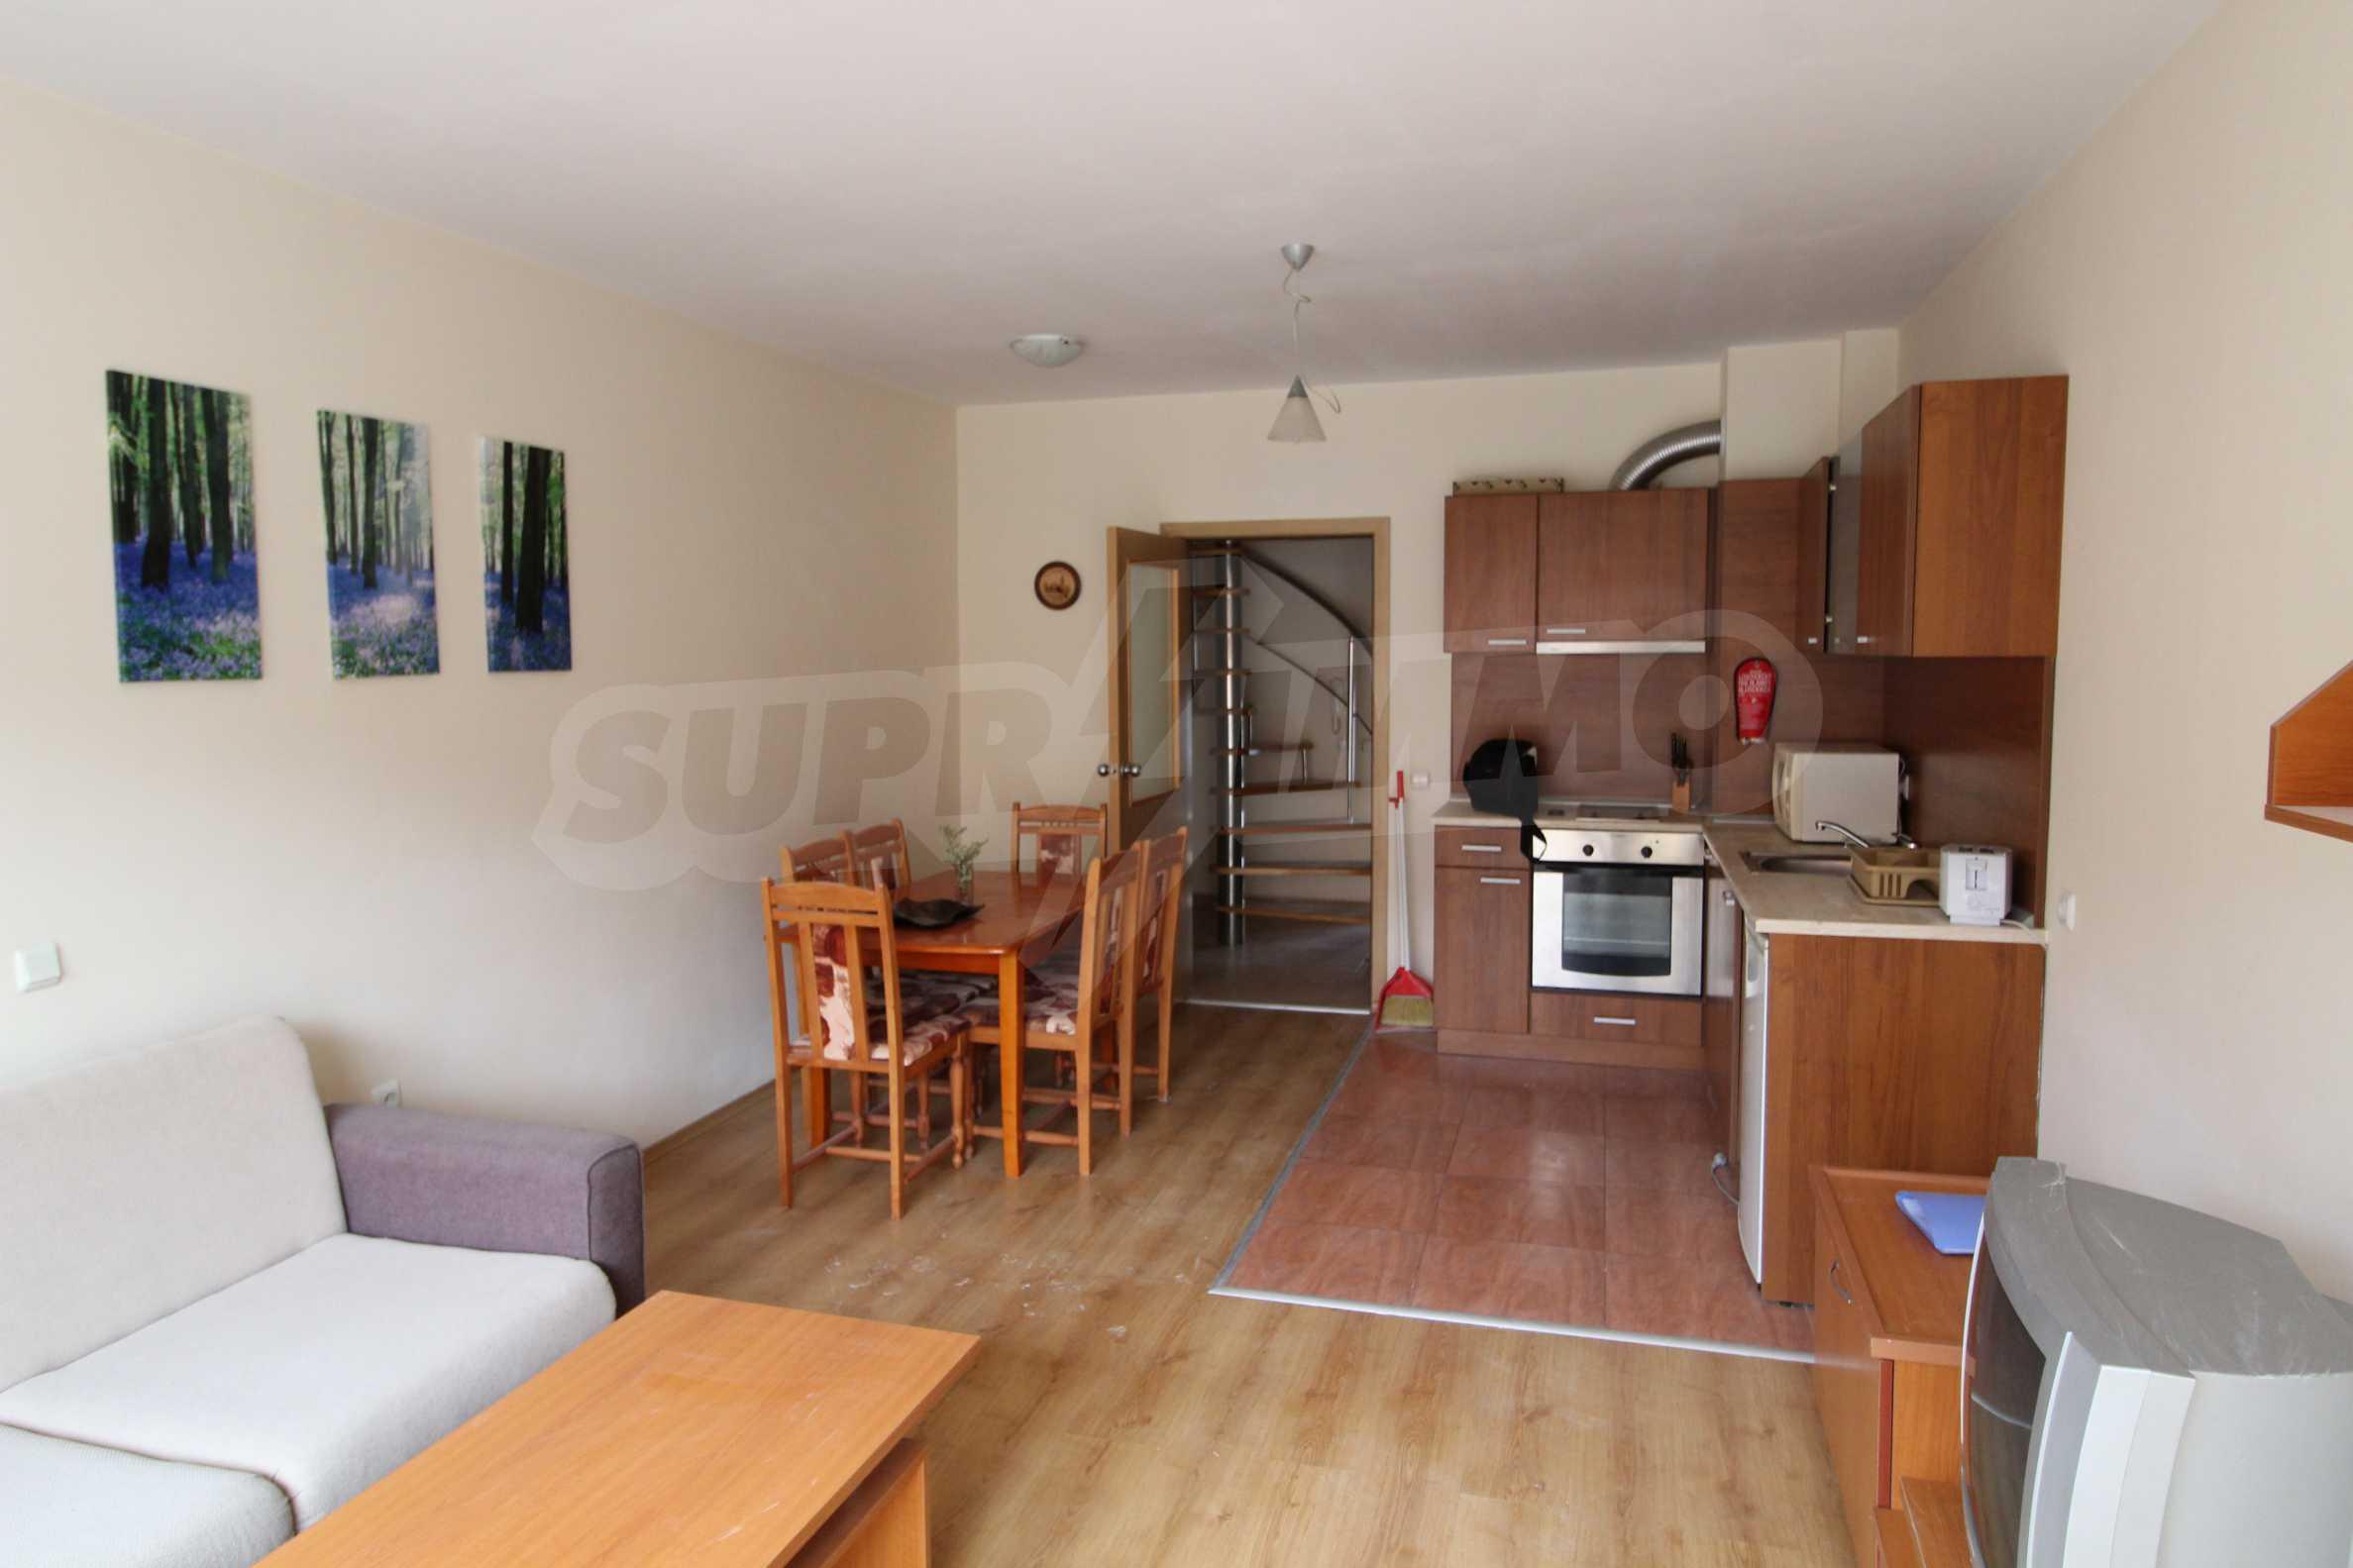 Тристаен апартамент в планински курорт Банско 3